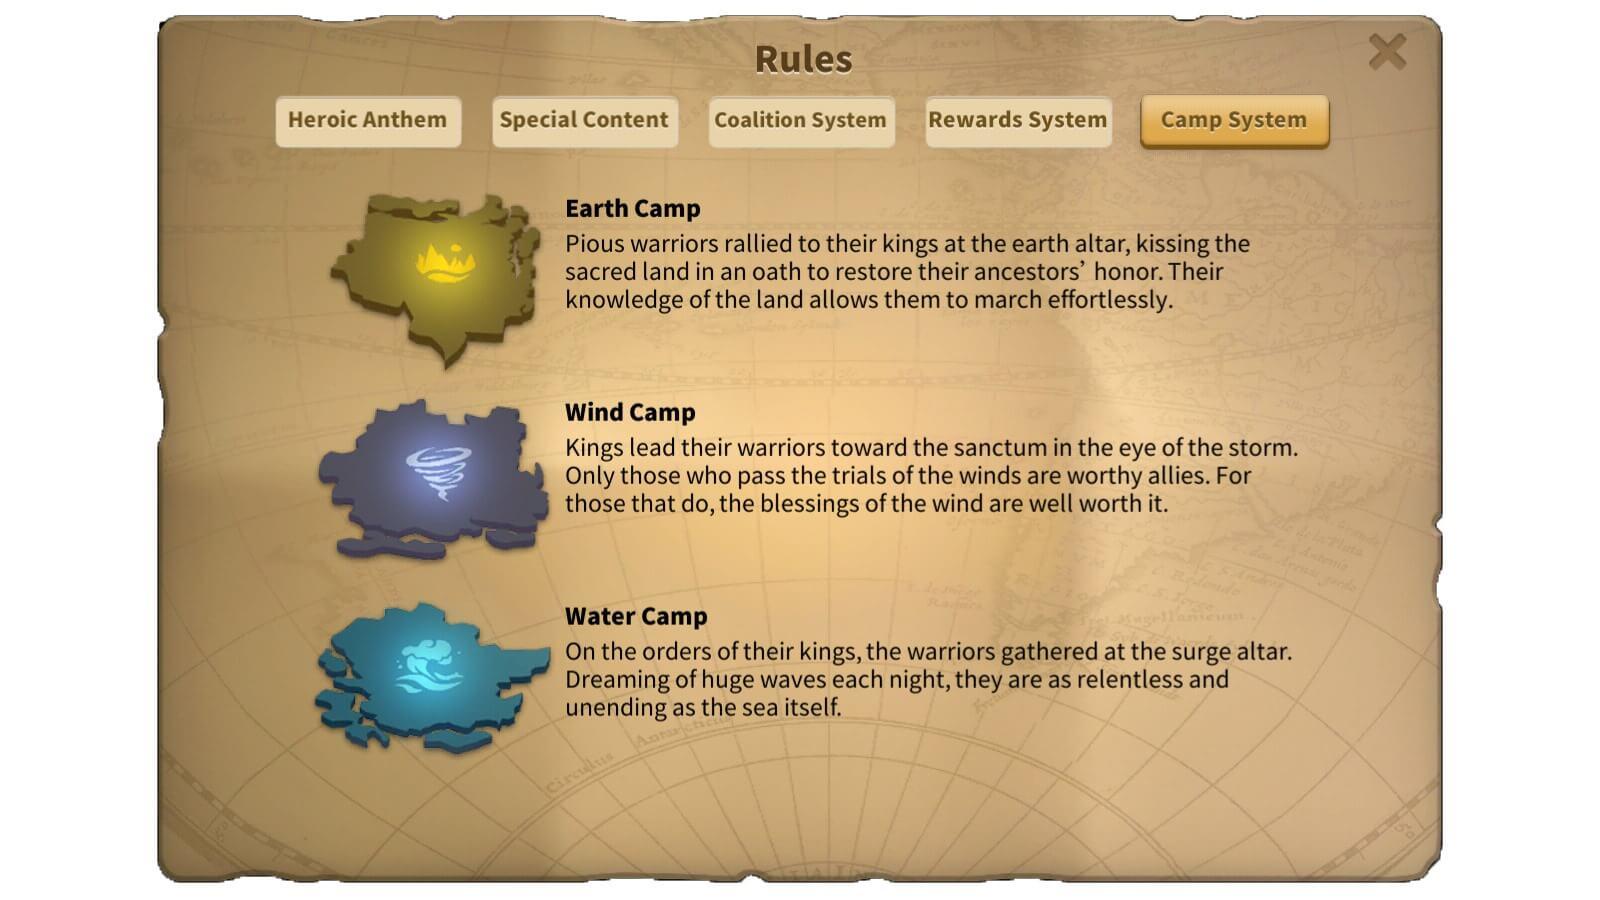 camp system 2